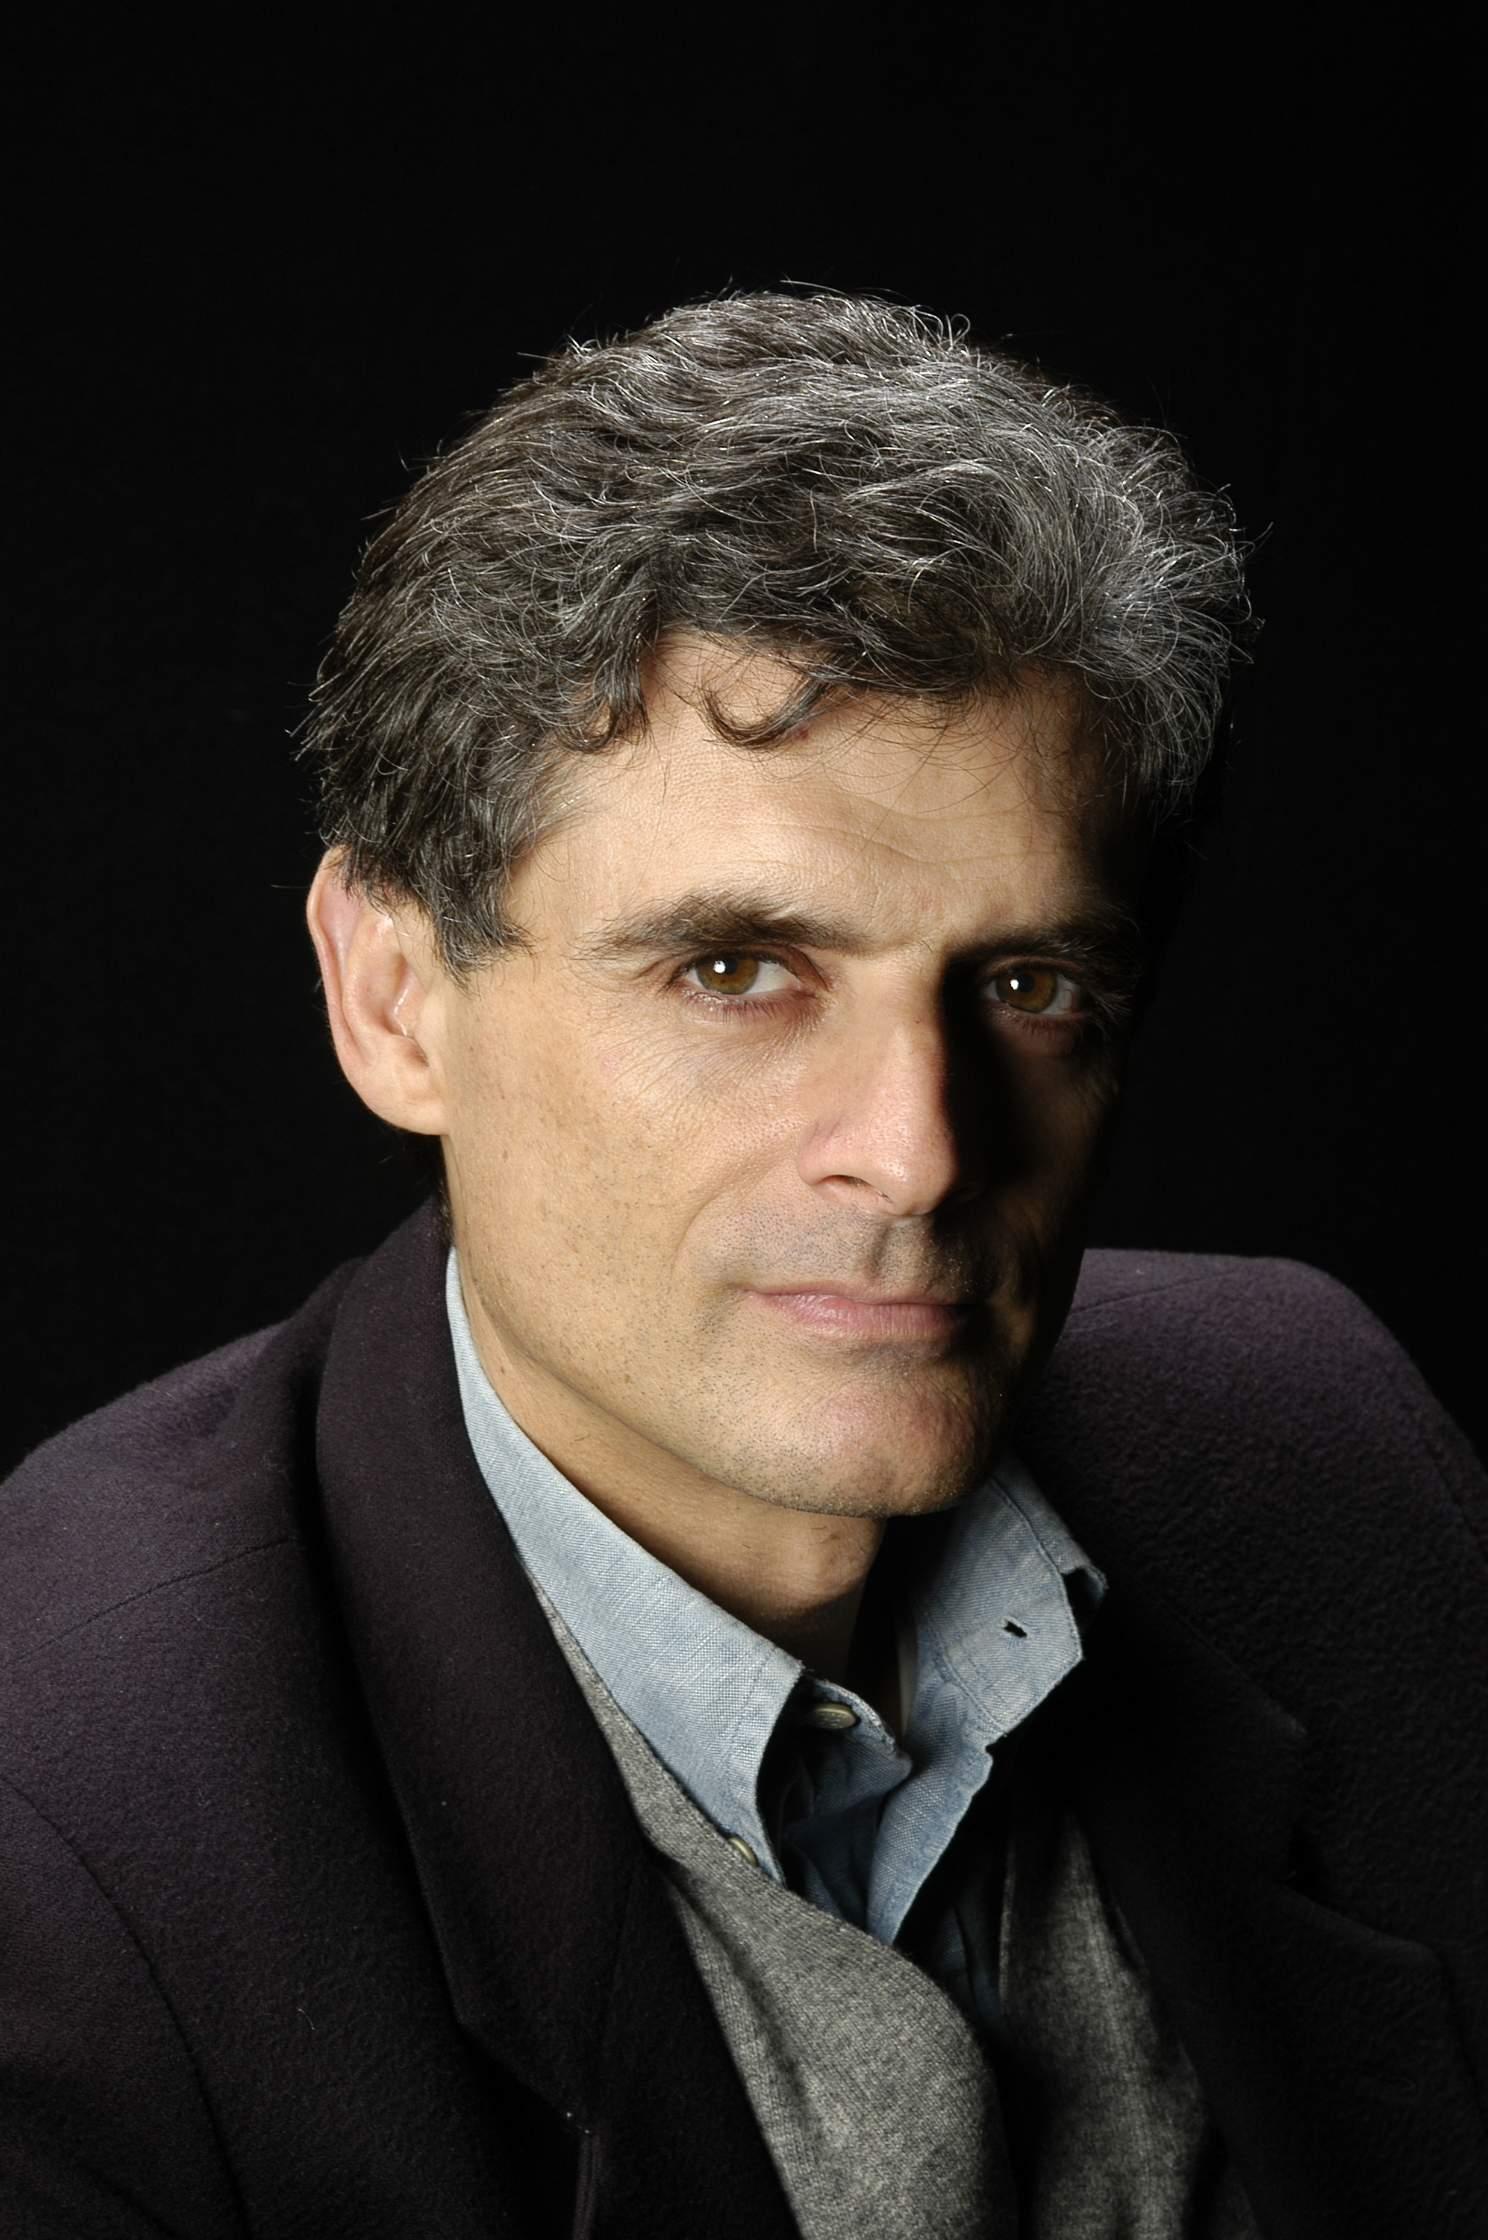 DR. JORGE PÉREZ-CALVO SOLER